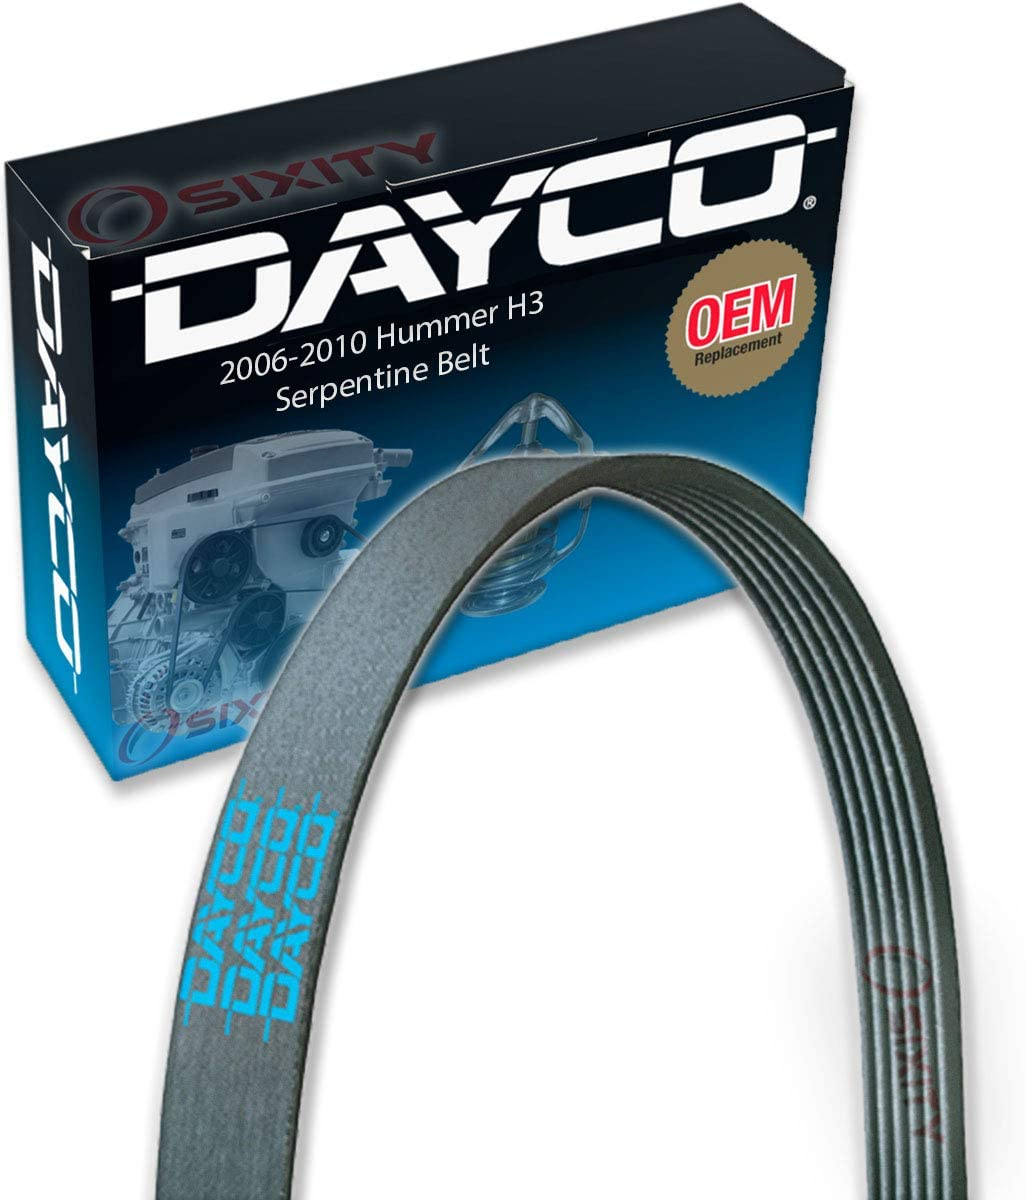 Dayco Serpentine Belt for 2006-2010 Hummer H3 3.7L L5 - V Belt Ribbed Accessory Drive